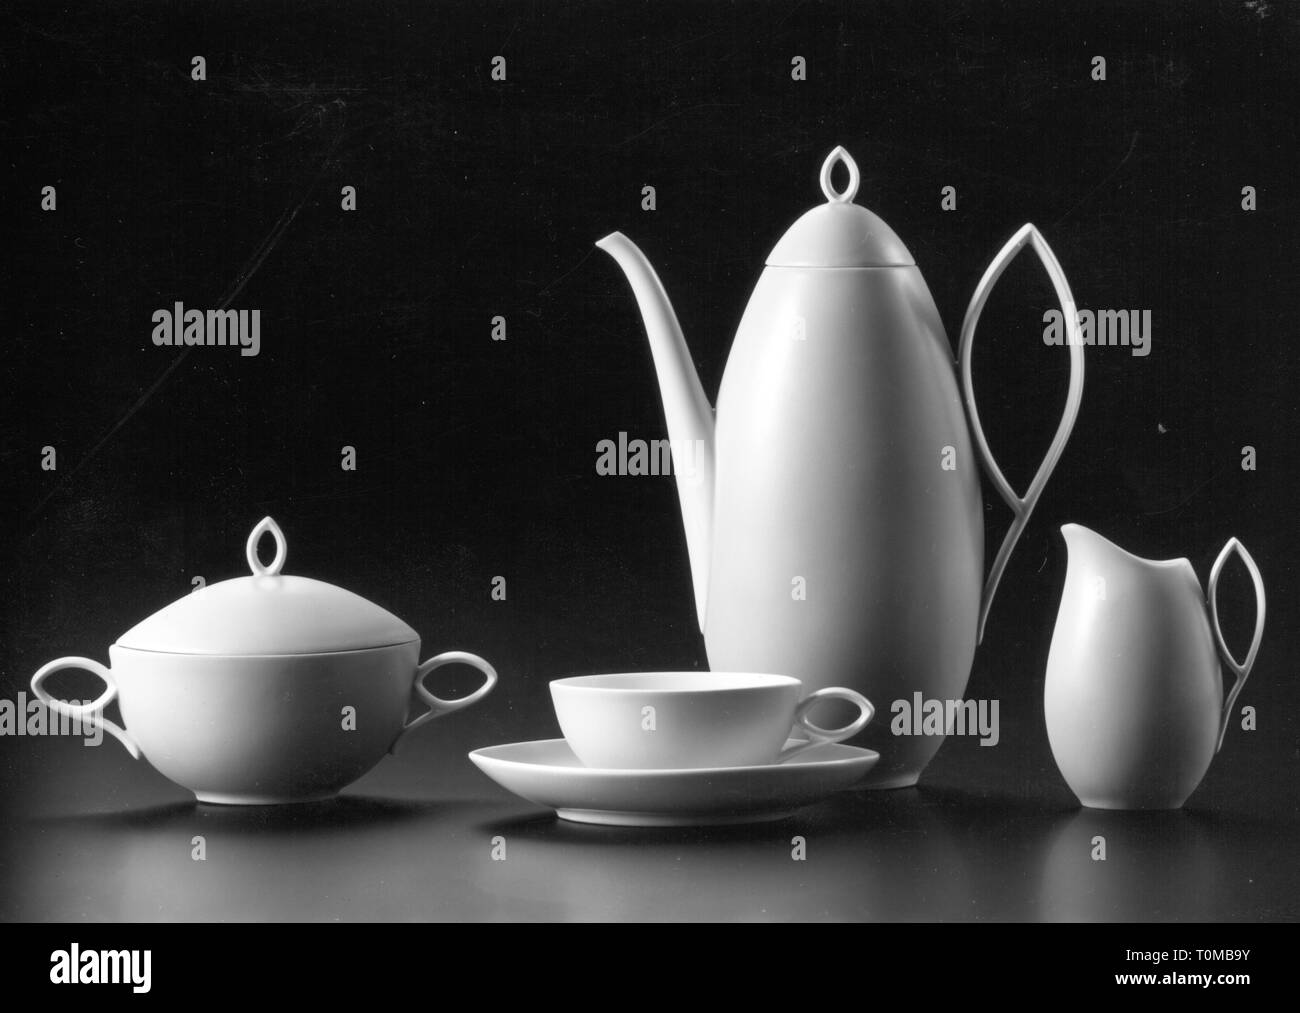 "Haushalt, Geschirr, moccaservice ""Oval"", Design: Rudolf Lunghard (1902-1983), Produzent: Rosenthal Ag, Selb, 1951 - 1961, Additional-Rights - Clearance-Info - Not-Available Stockbild"